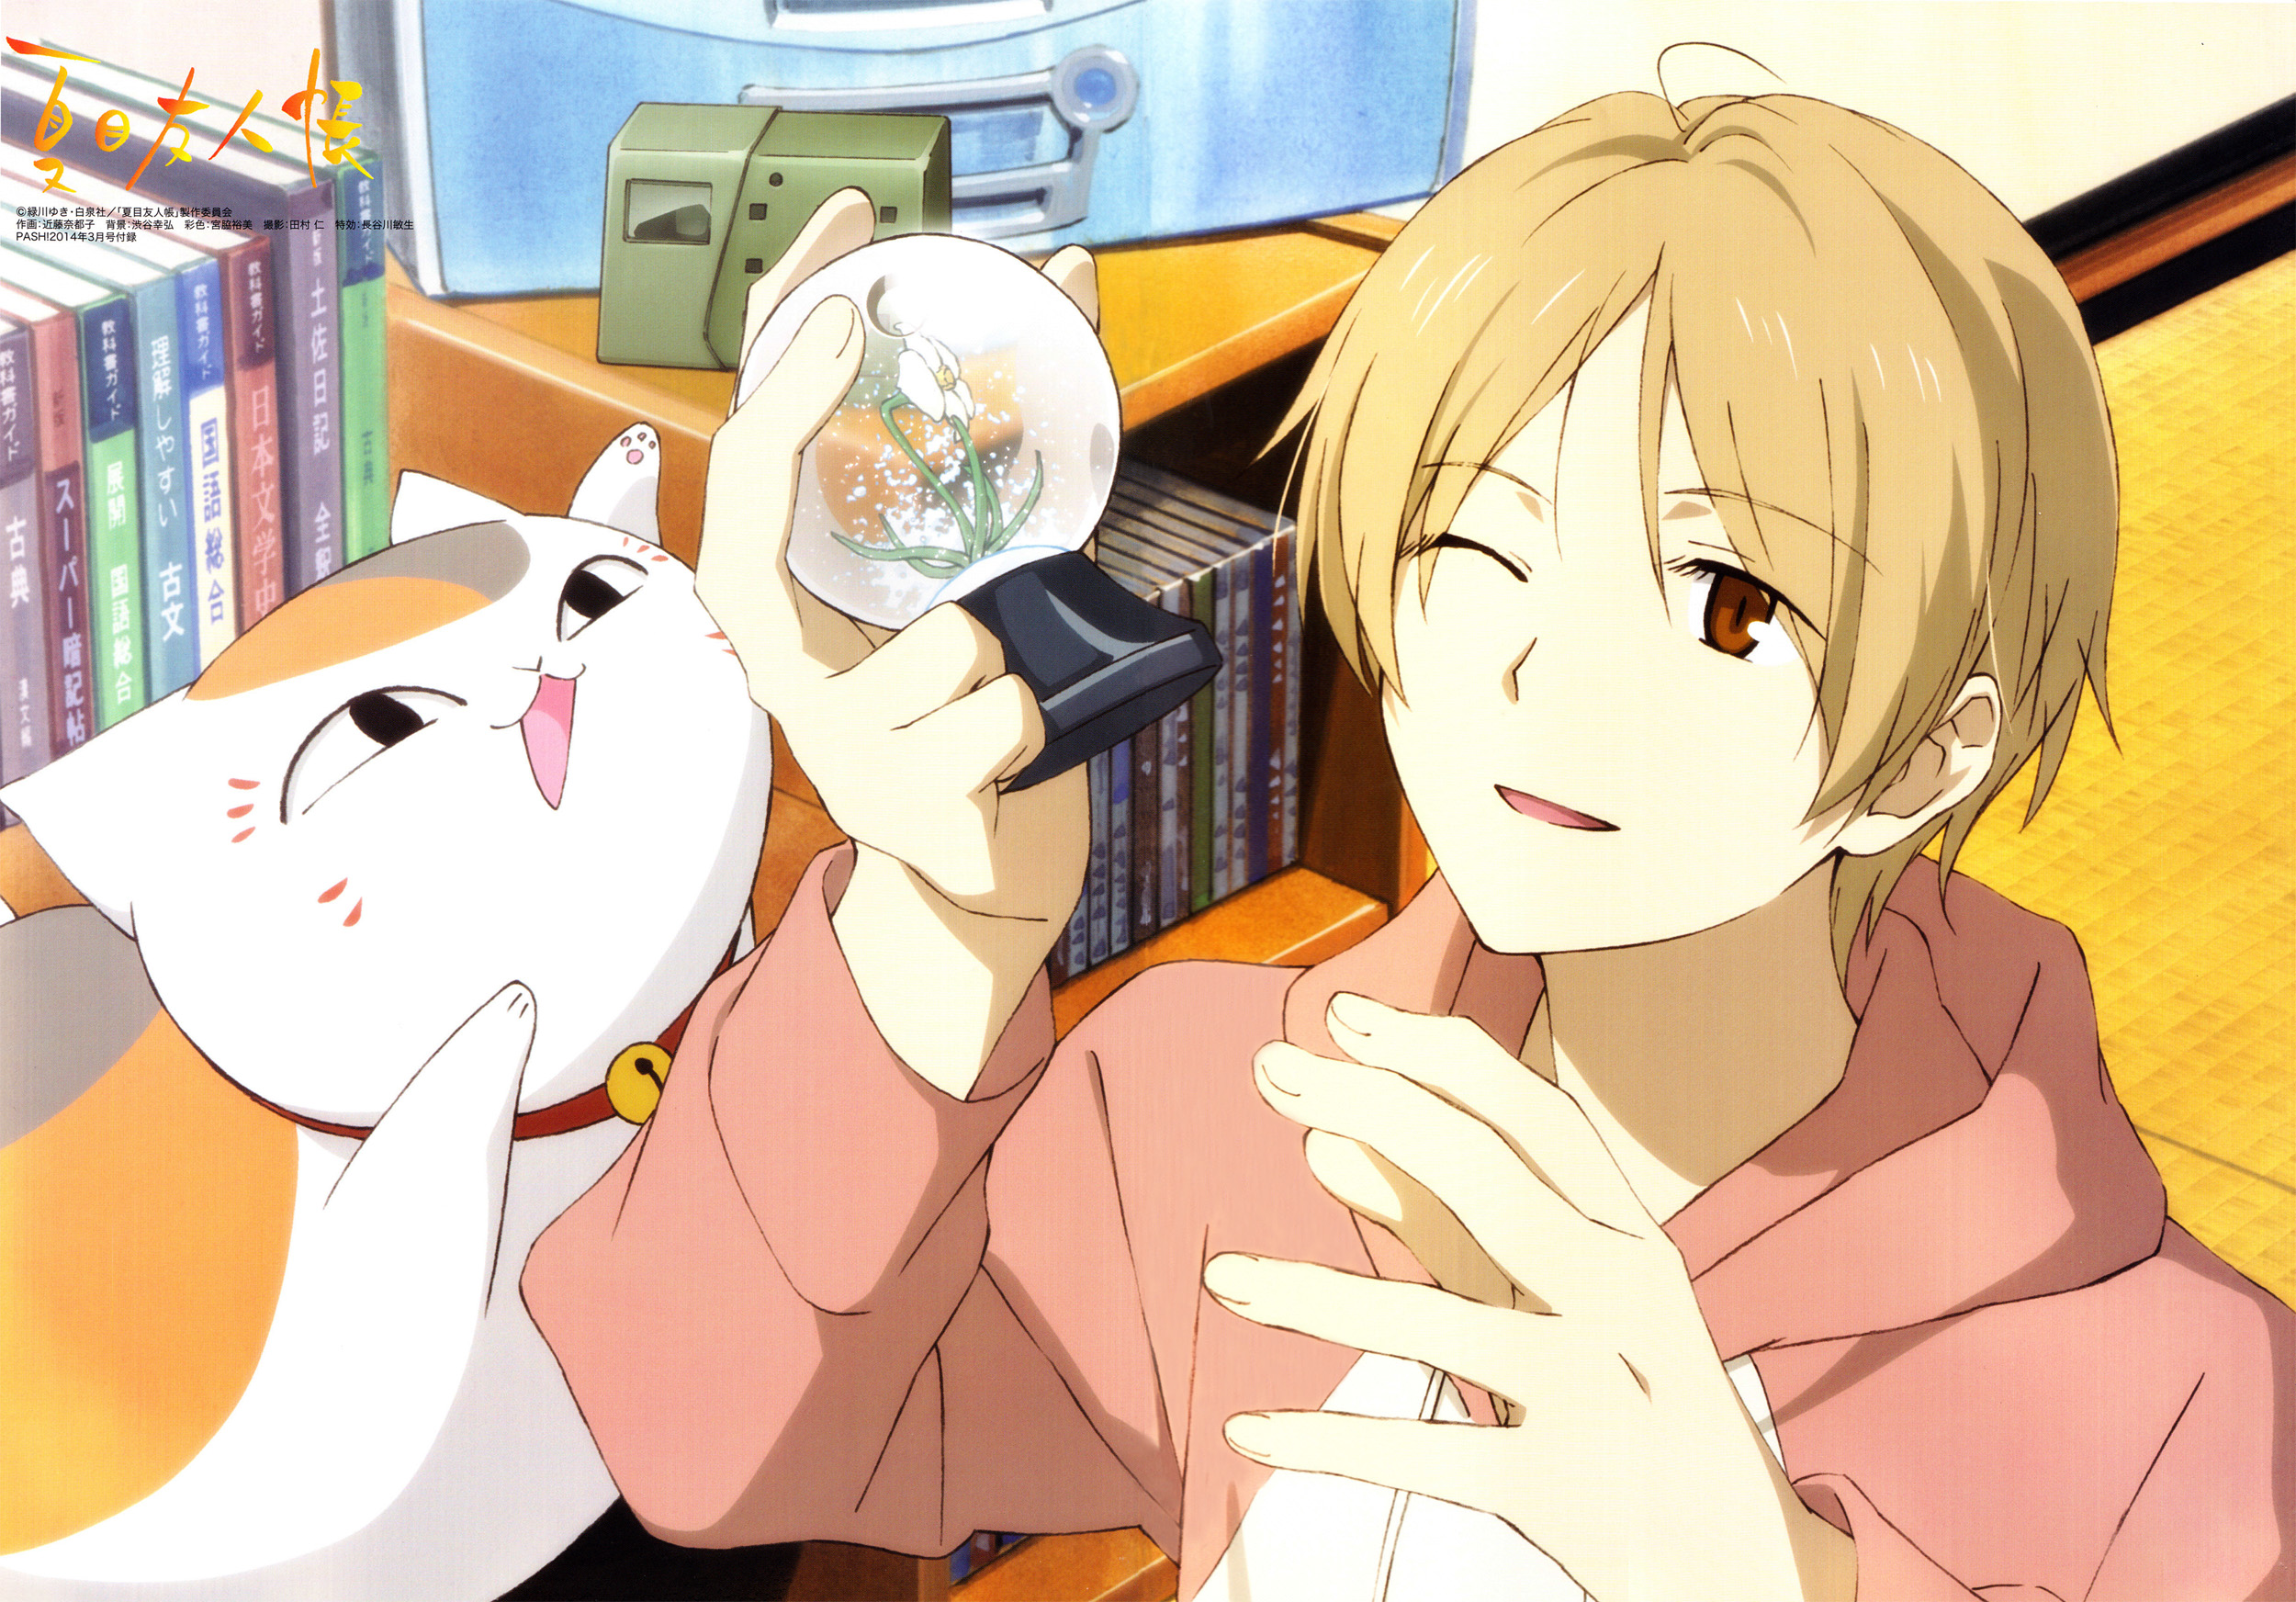 anime_wallpaper_natsume_yuujinnchou-77894933.jpg